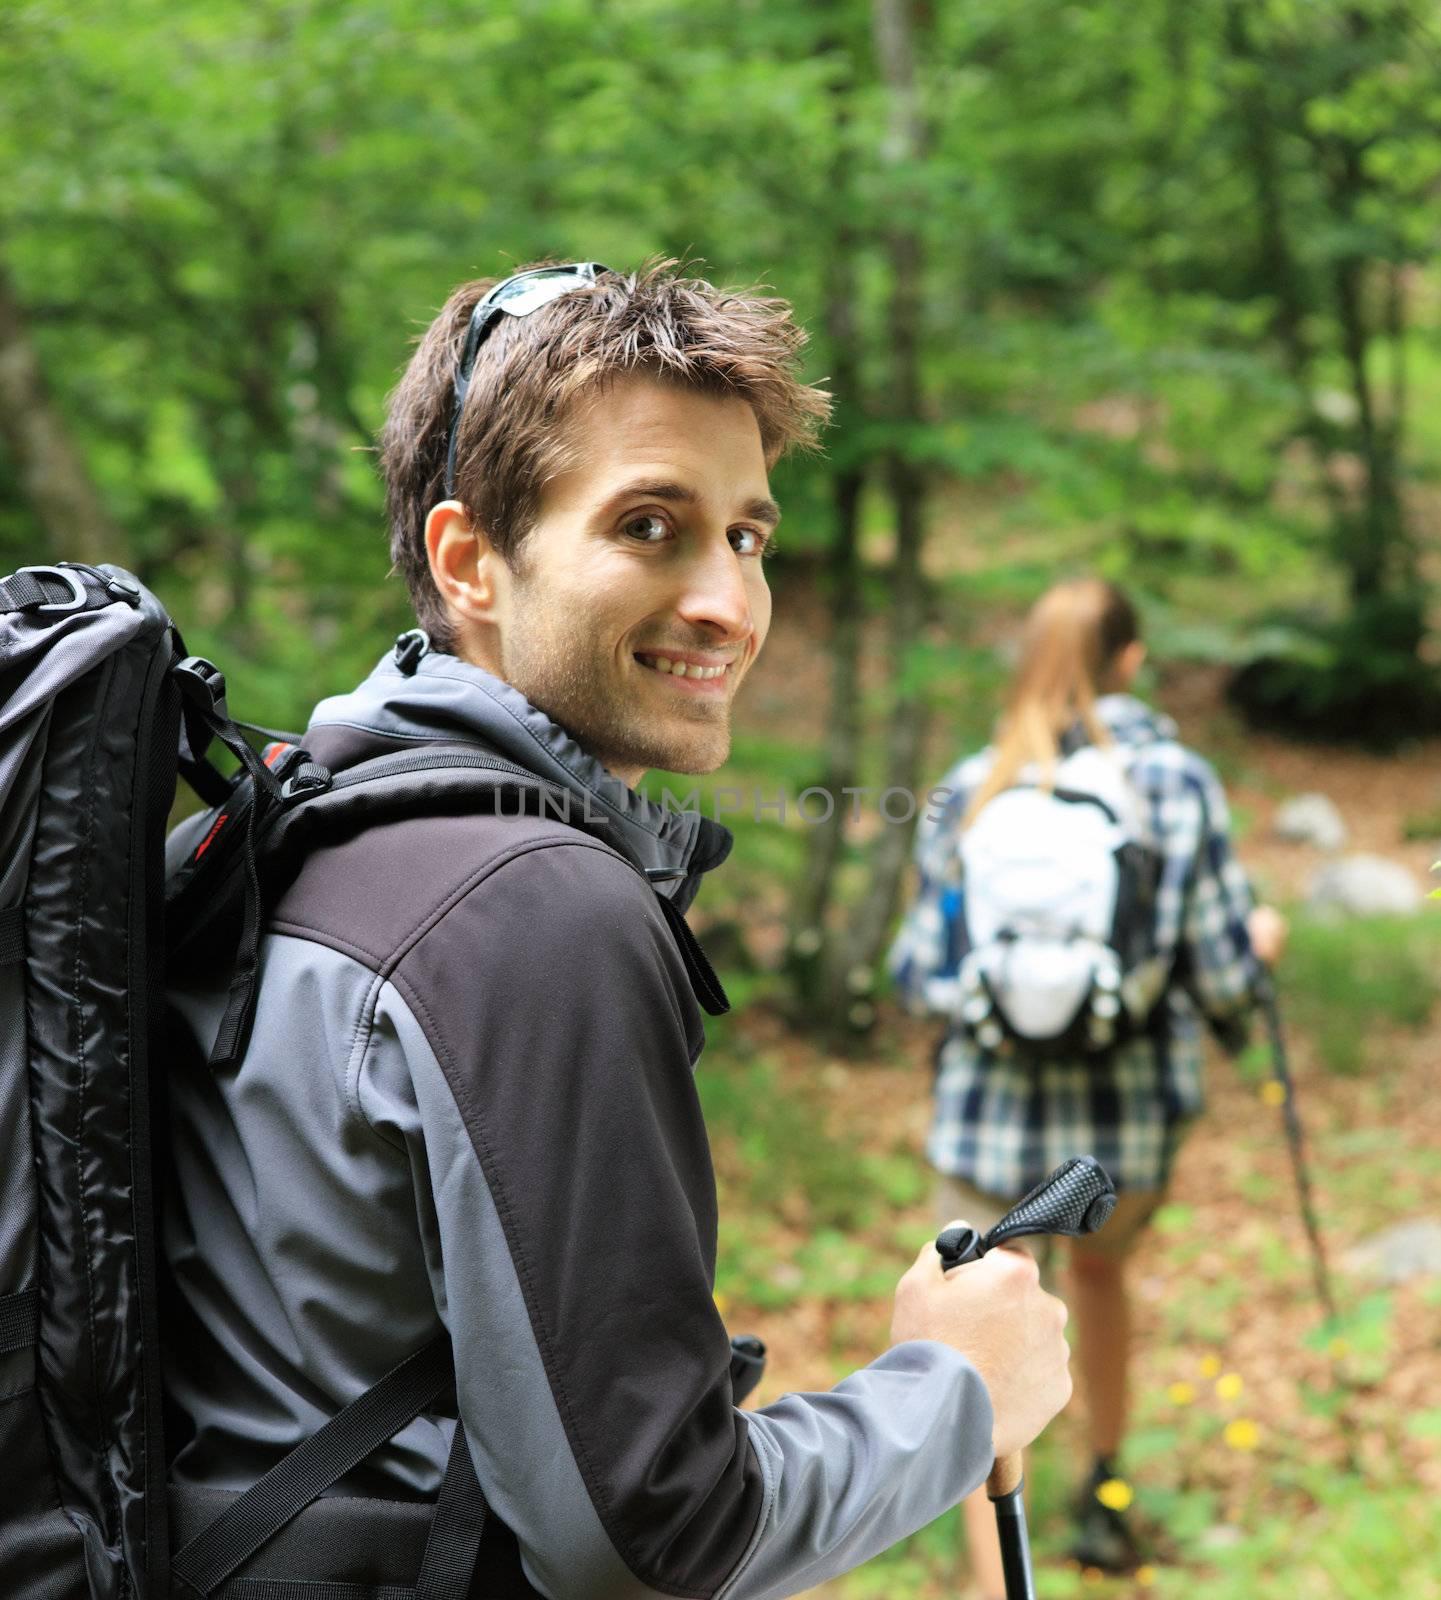 Young couple enjoying a nordic walk, man looking at camera and smiling